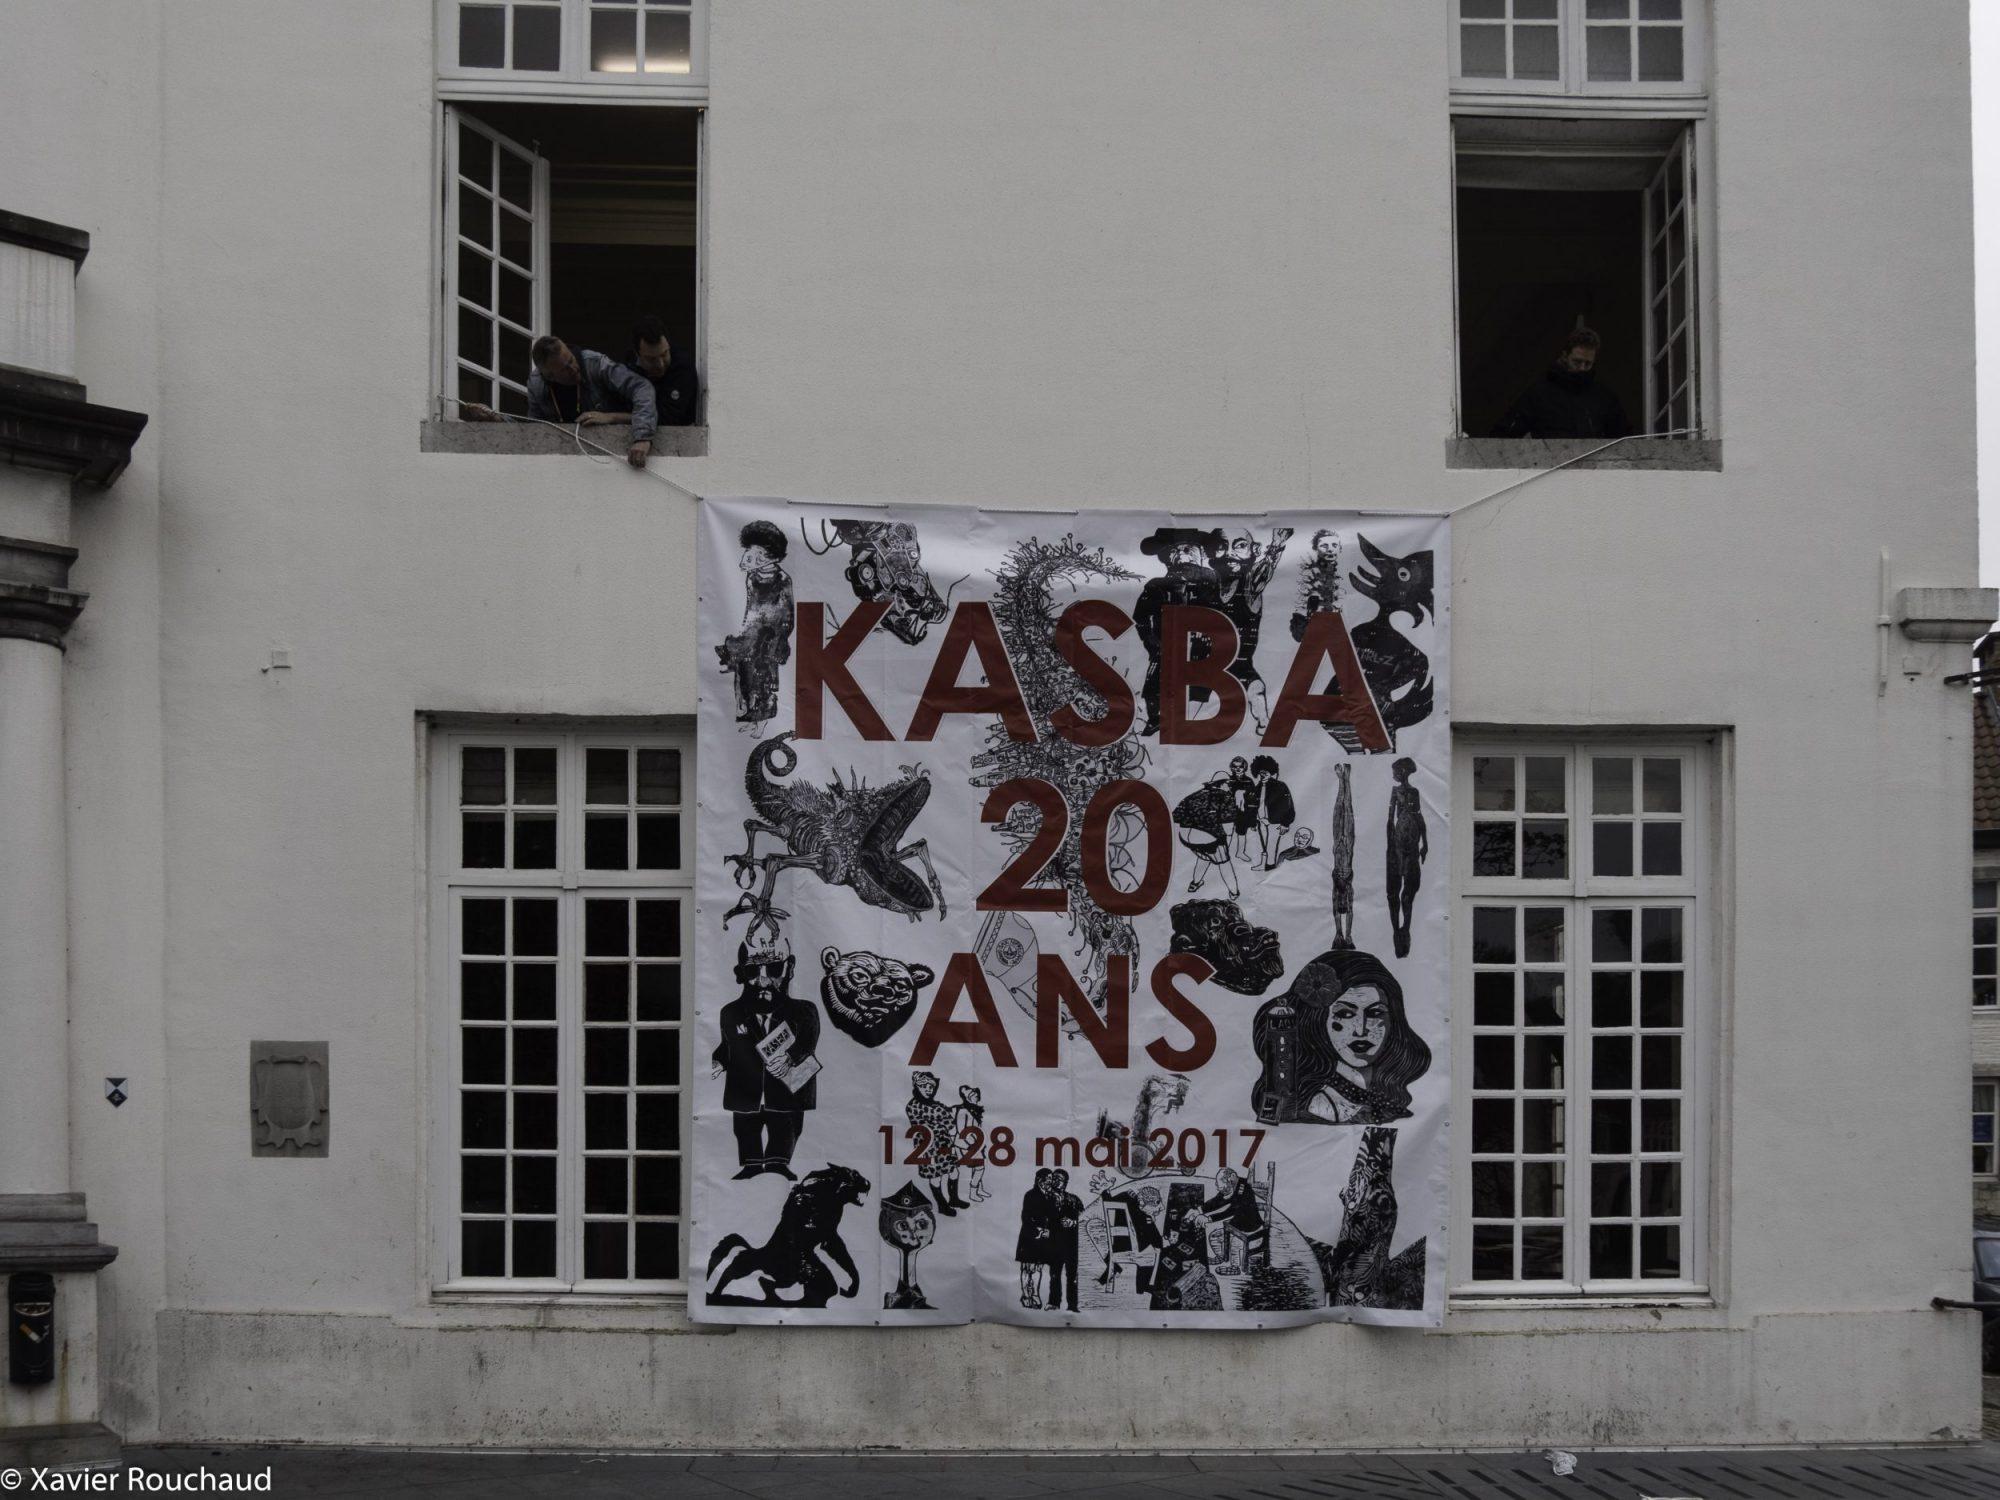 kasba 20 ans bache-